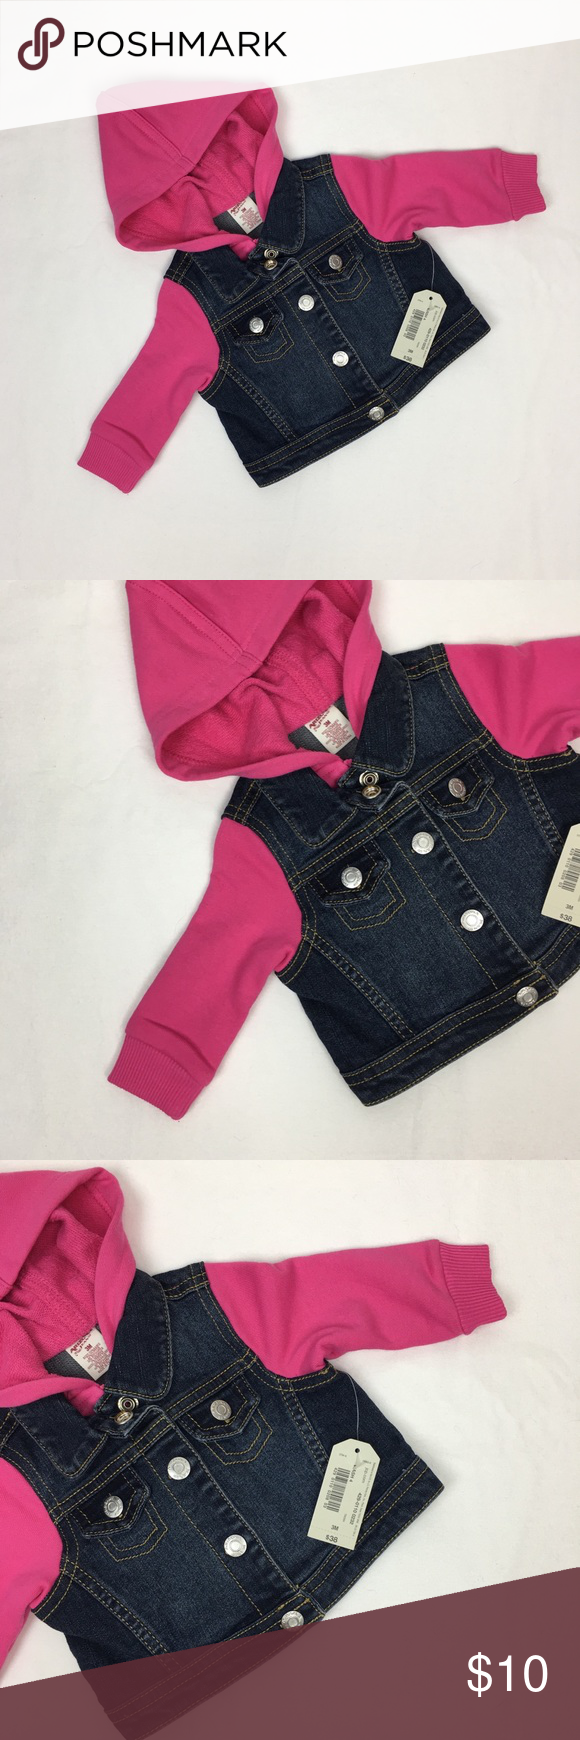 8f2e4efca53b Wrangler Pink Baby Girl Denim Jacket NWT NWT